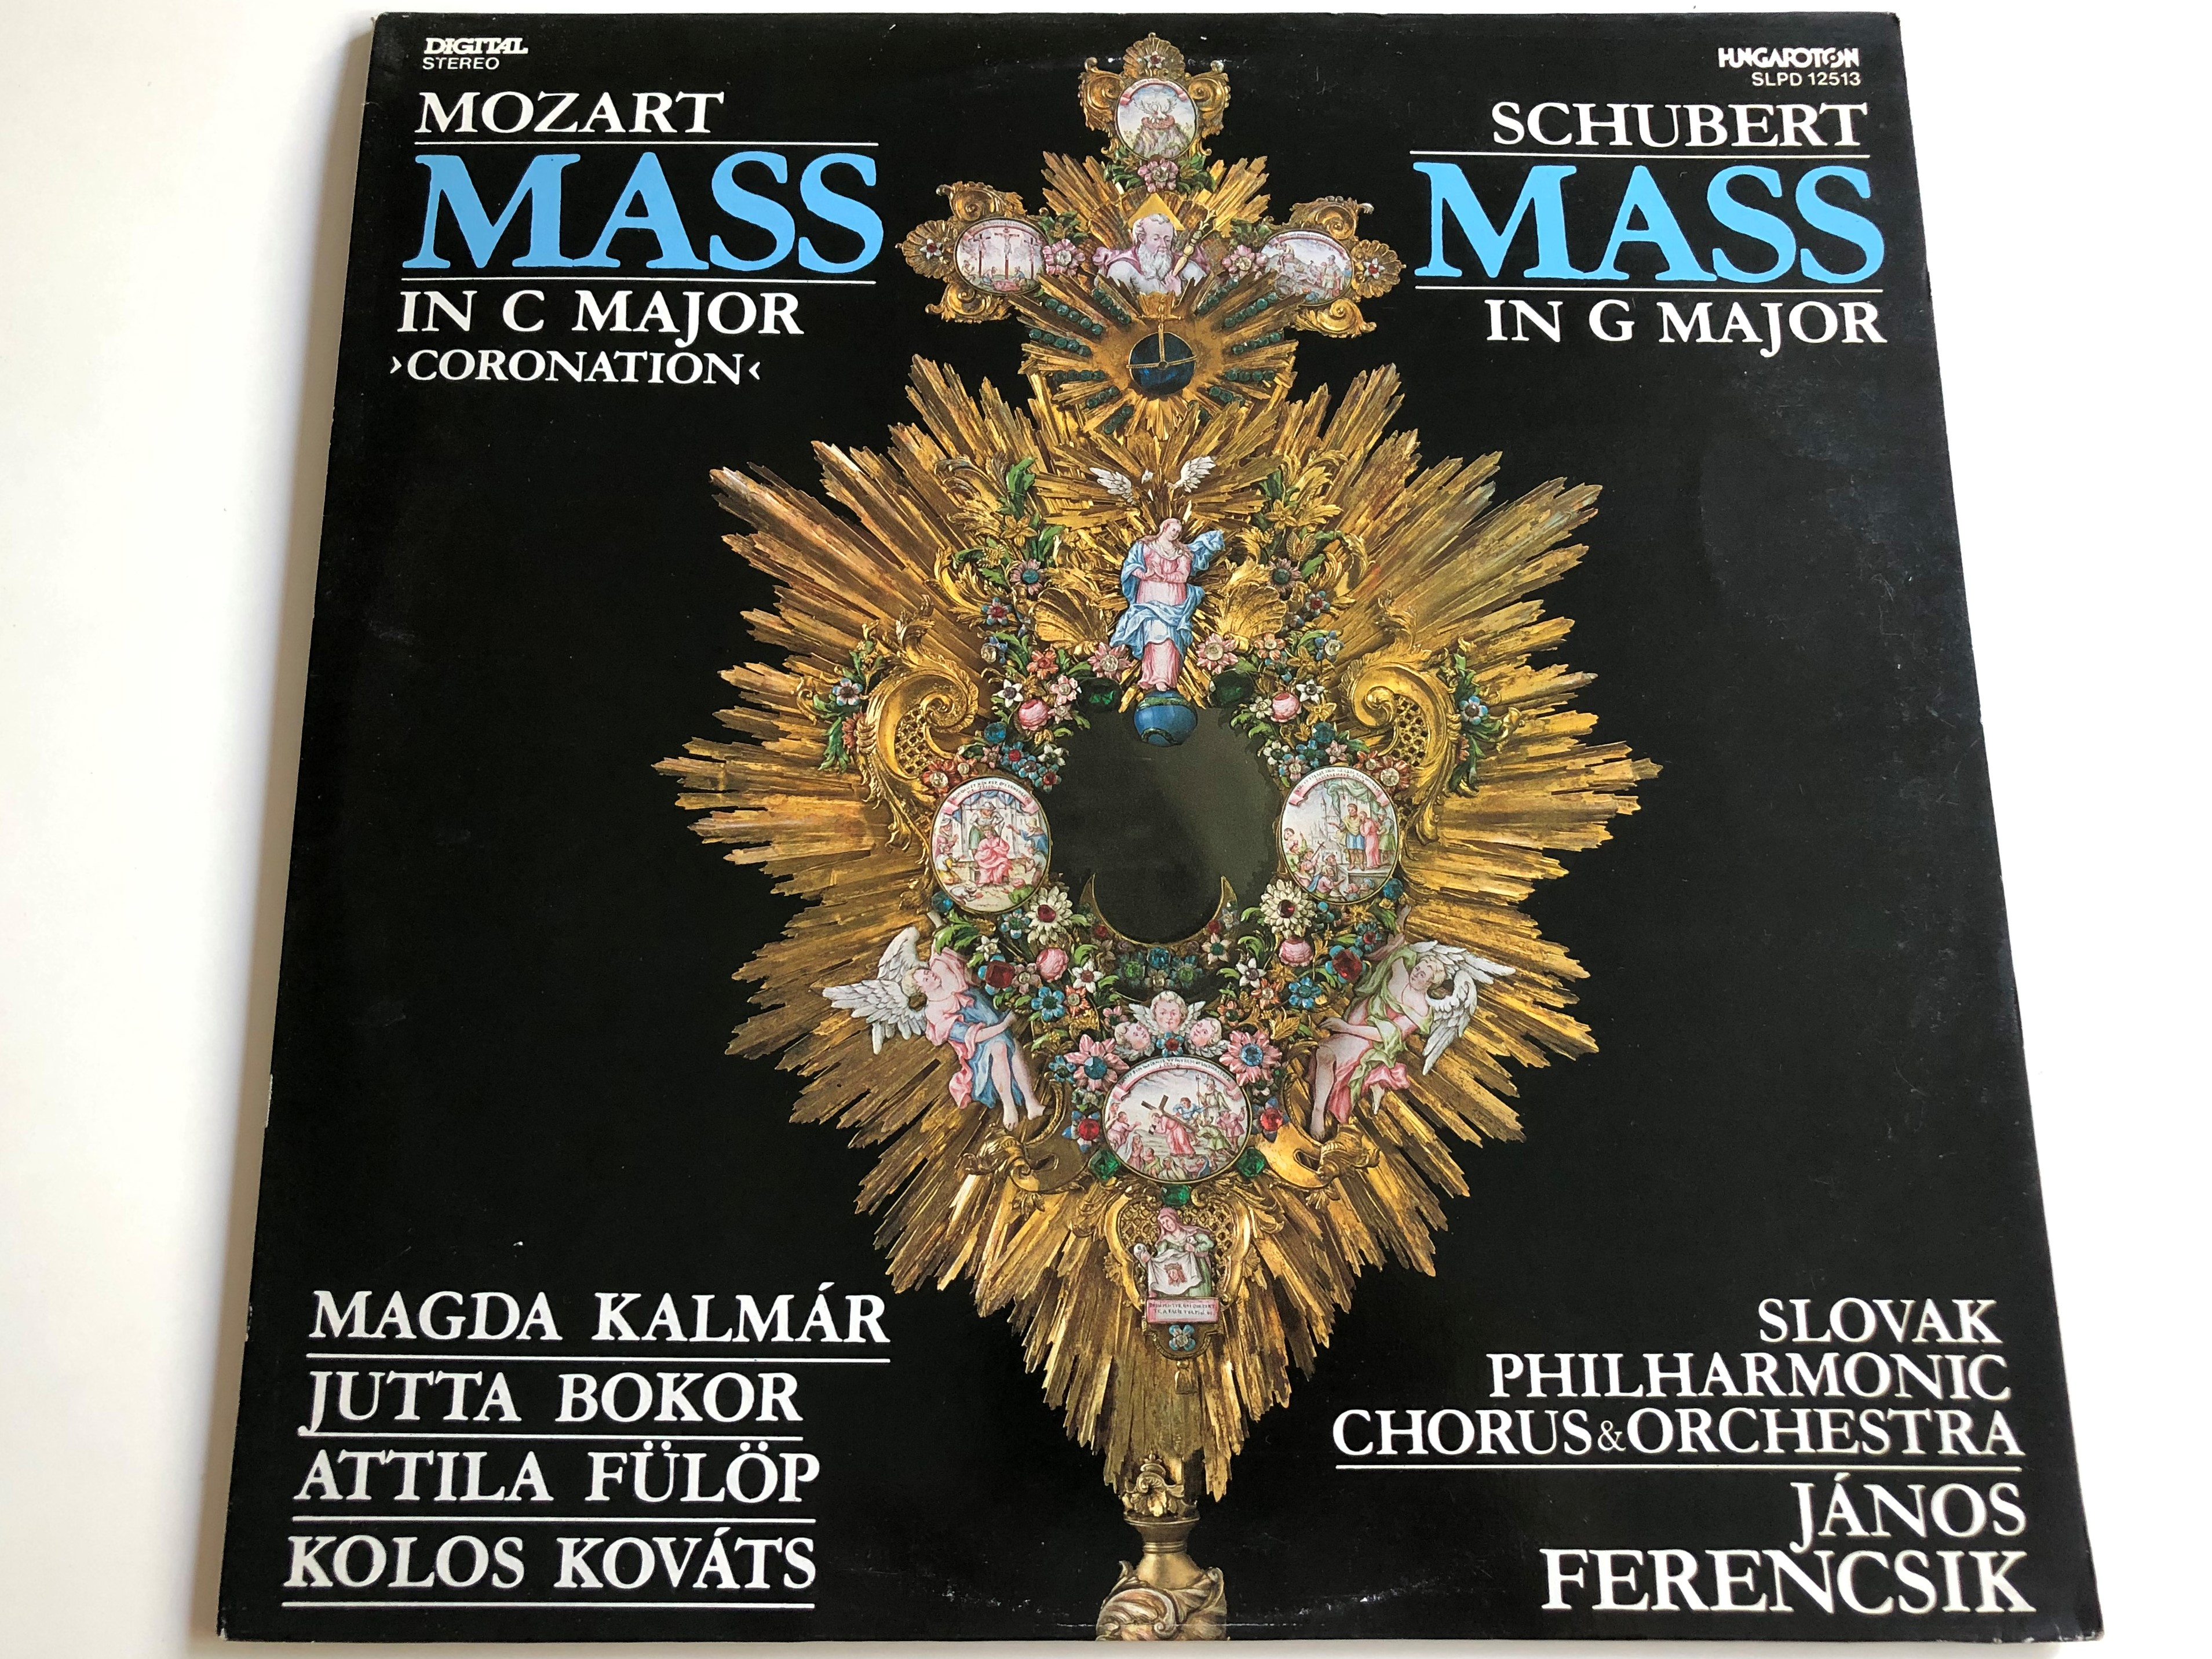 mozart-mass-in-c-major-coronation-schubert-mass-in-g-major-magda-kalm-r-jutta-bokor-attila-f-l-p-kolos-kov-ts-slovak-philharmonic-chorus-orchestra-conducted-by-j-nos-ferencsik-hungaroton-slpd-12513-lp-1-.jpg